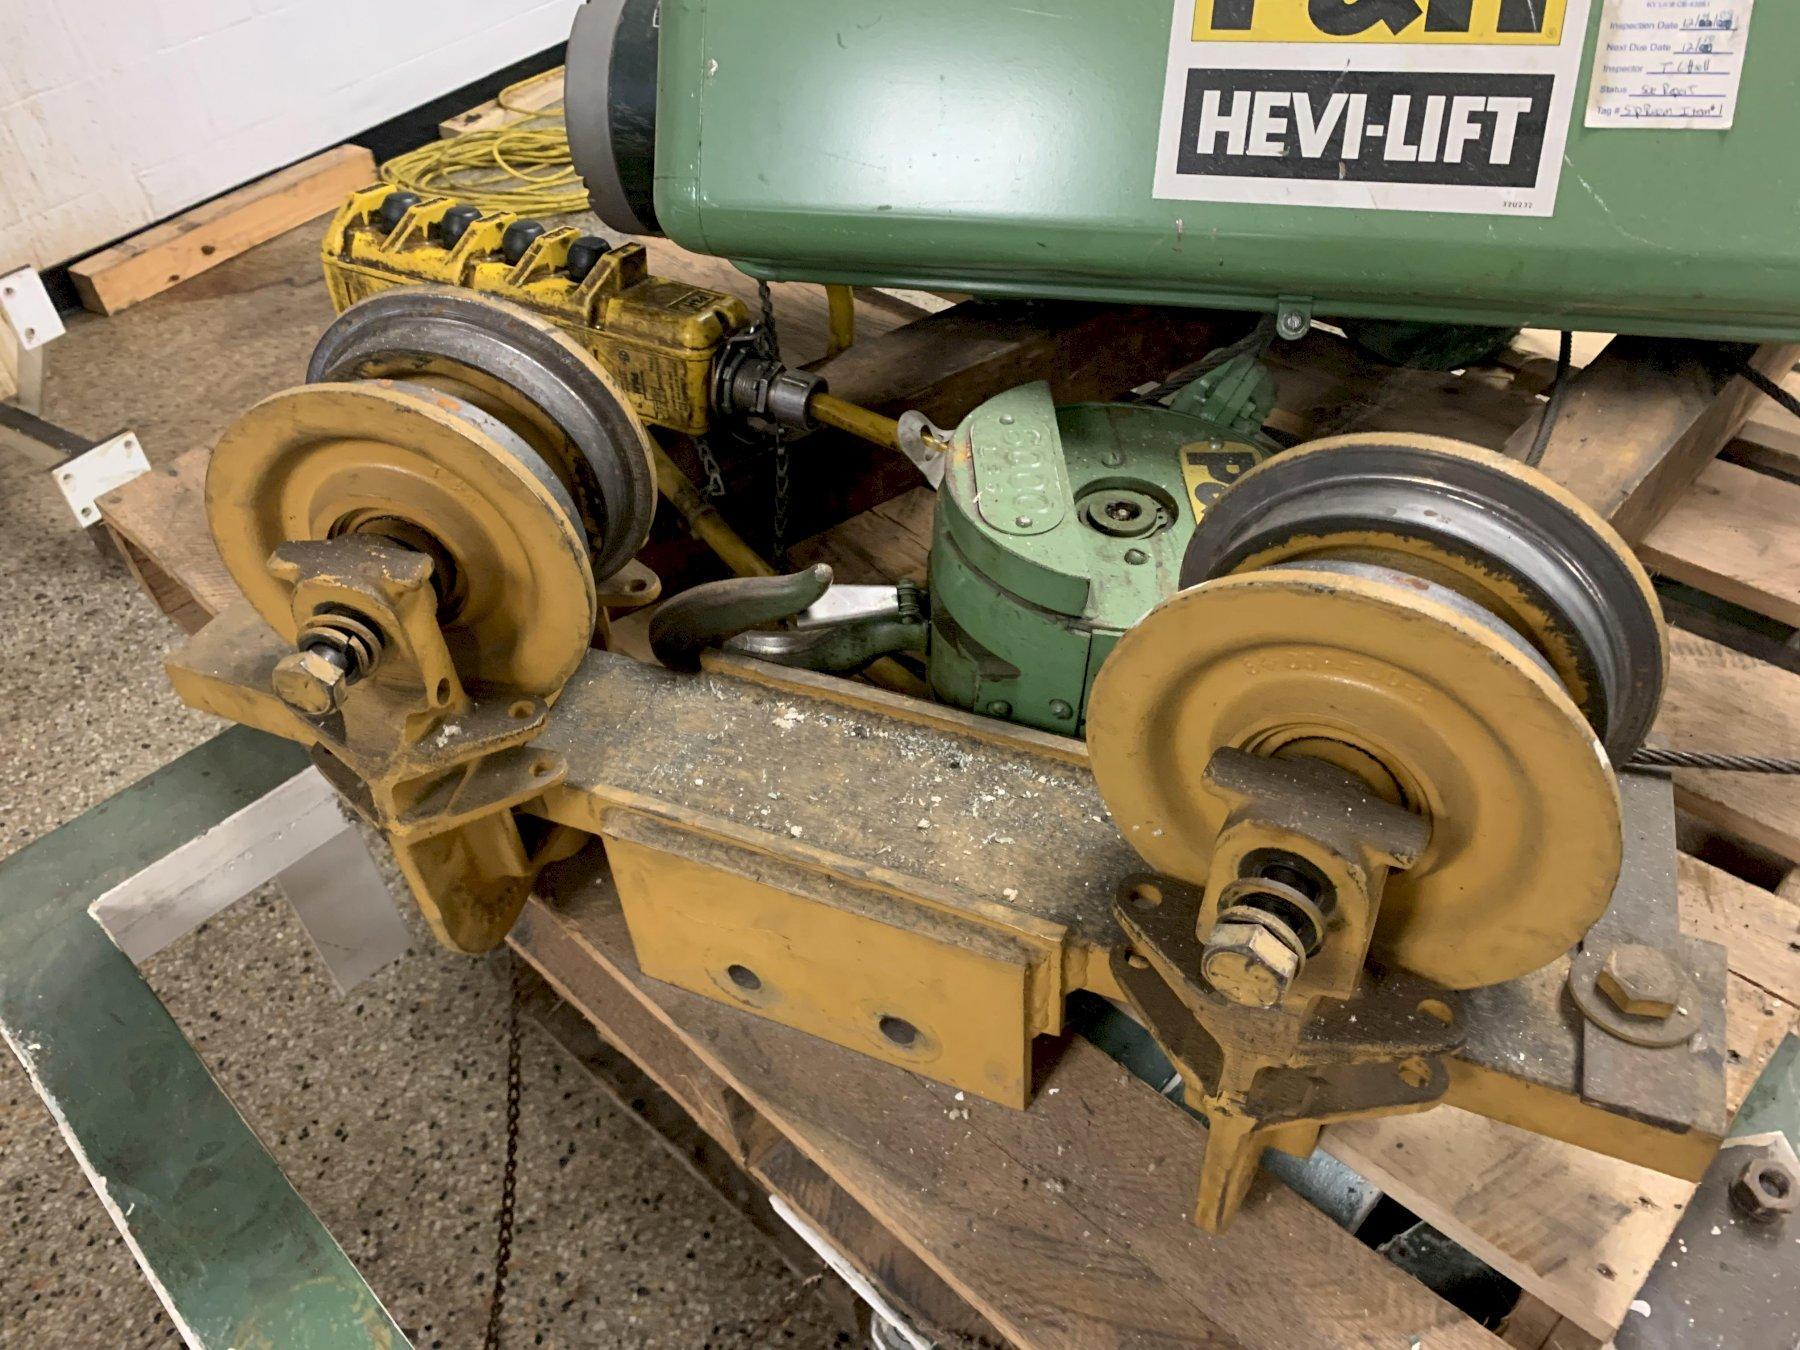 P&H Hevi-Lift 3 Ton Electric Hoist, Cat #5B332-1, S/N 613546,